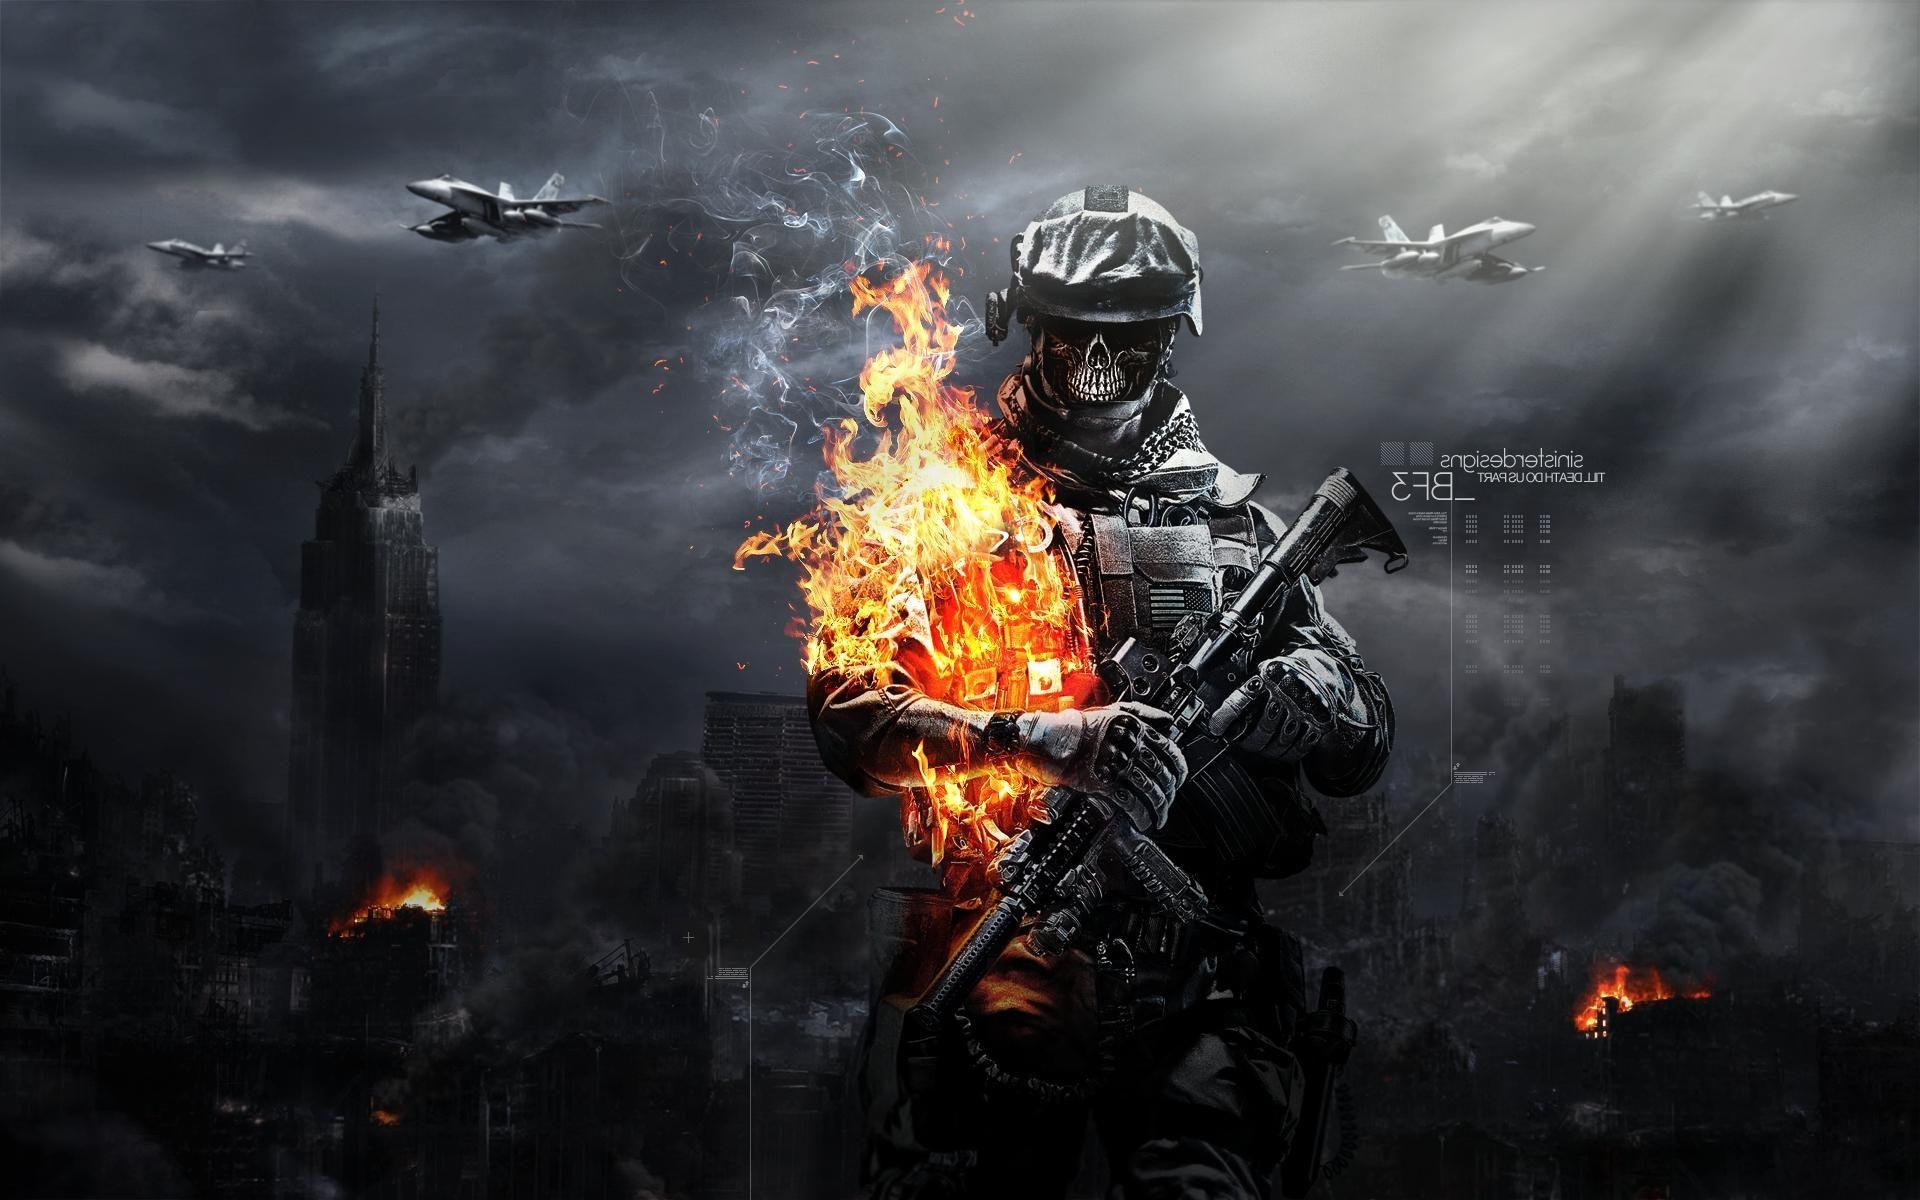 The 25  best Battlefield 3 ideas on Pinterest   Battlefield 4 ...